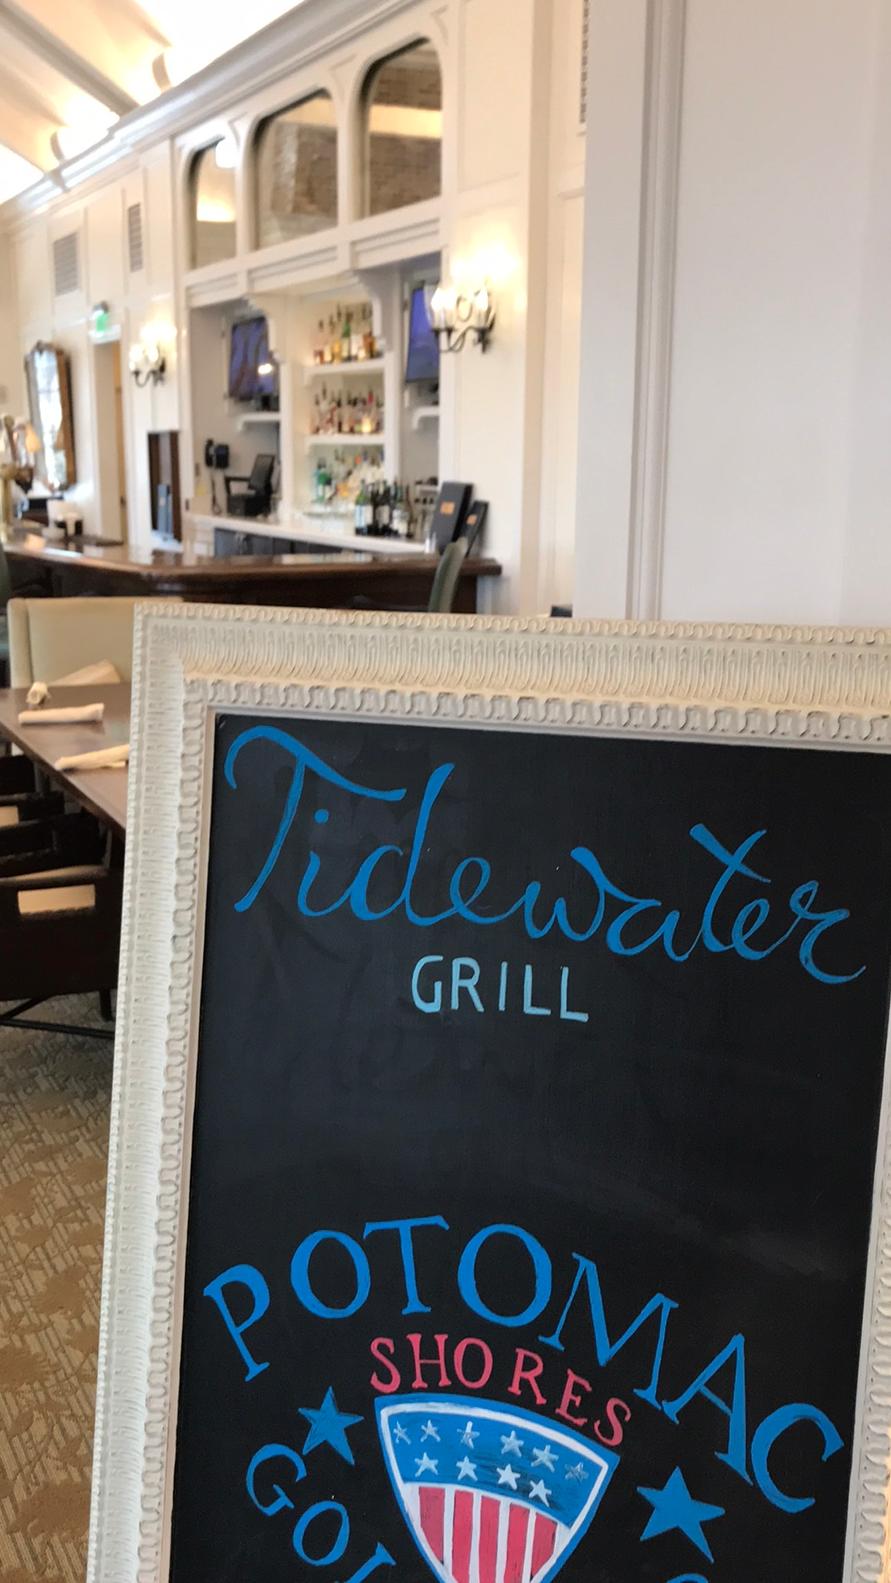 Tidewater Grill   restaurant   1750 Dunnington Pl, Dumfries, VA 22026, USA   5713833055 OR +1 571-383-3055